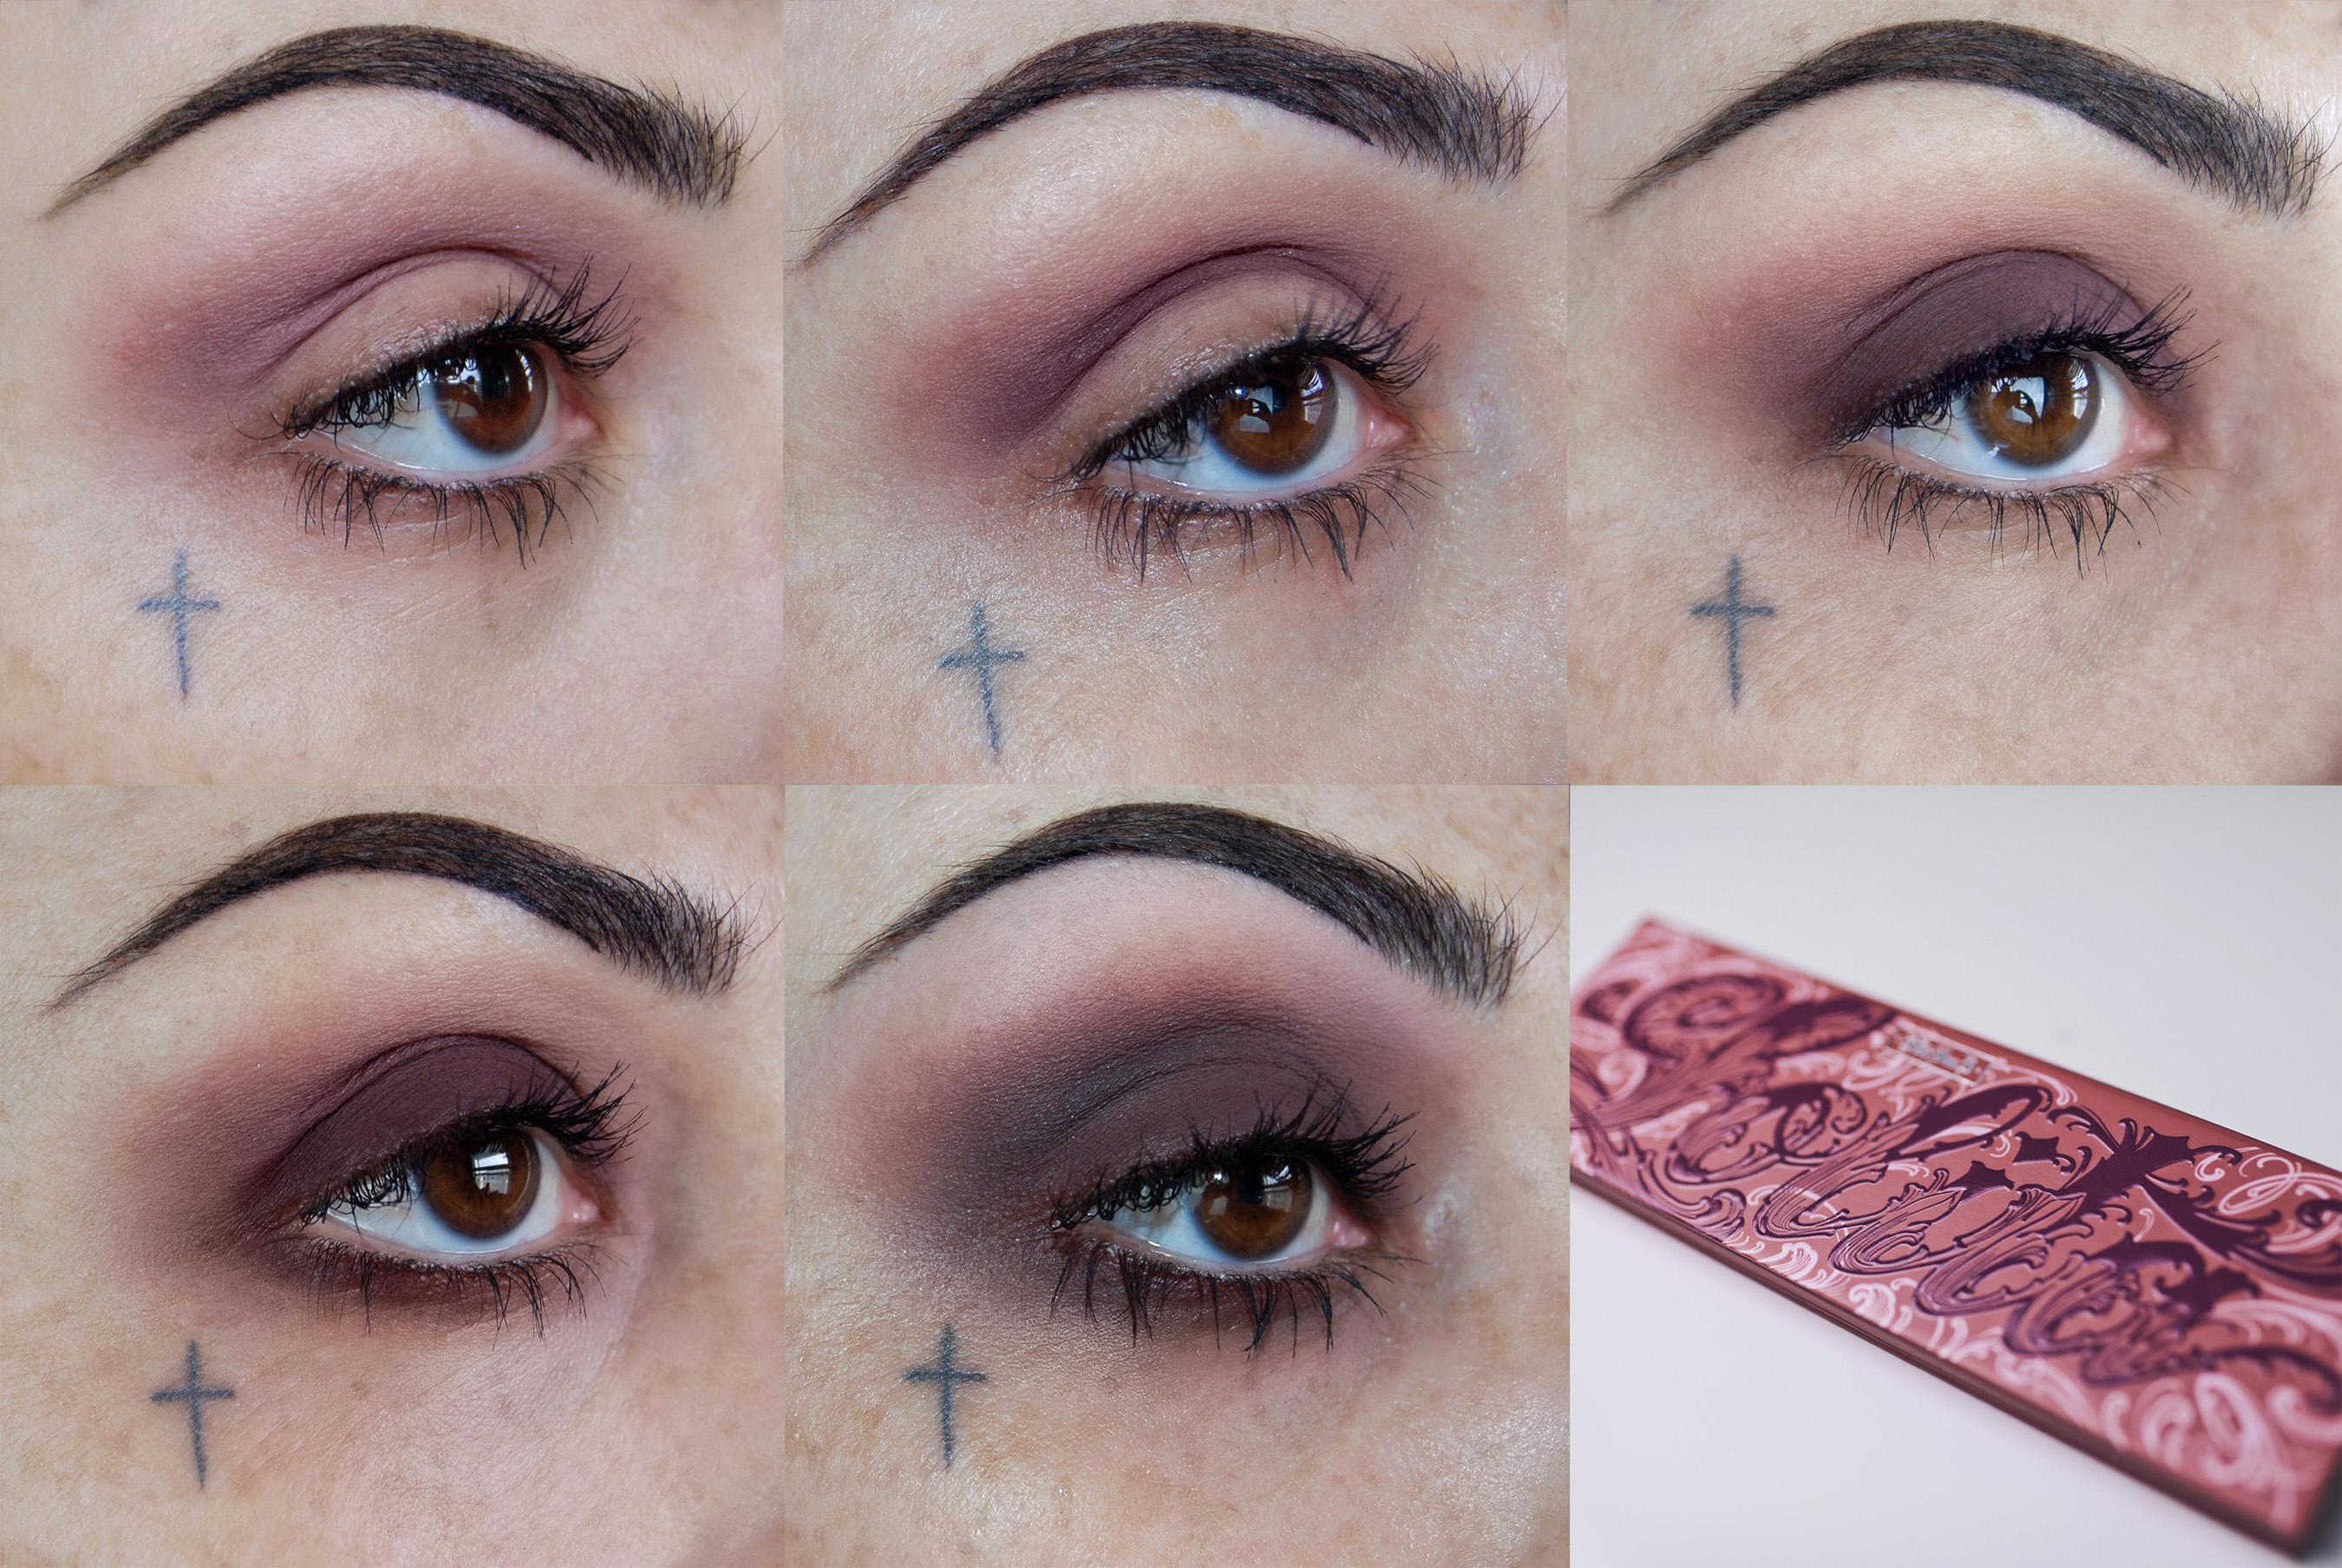 Kat Von D Beauty Artistry Collective Global Artist Leah Carmichael (@iamleah) wears the new Lolita Eyeshadow Palette